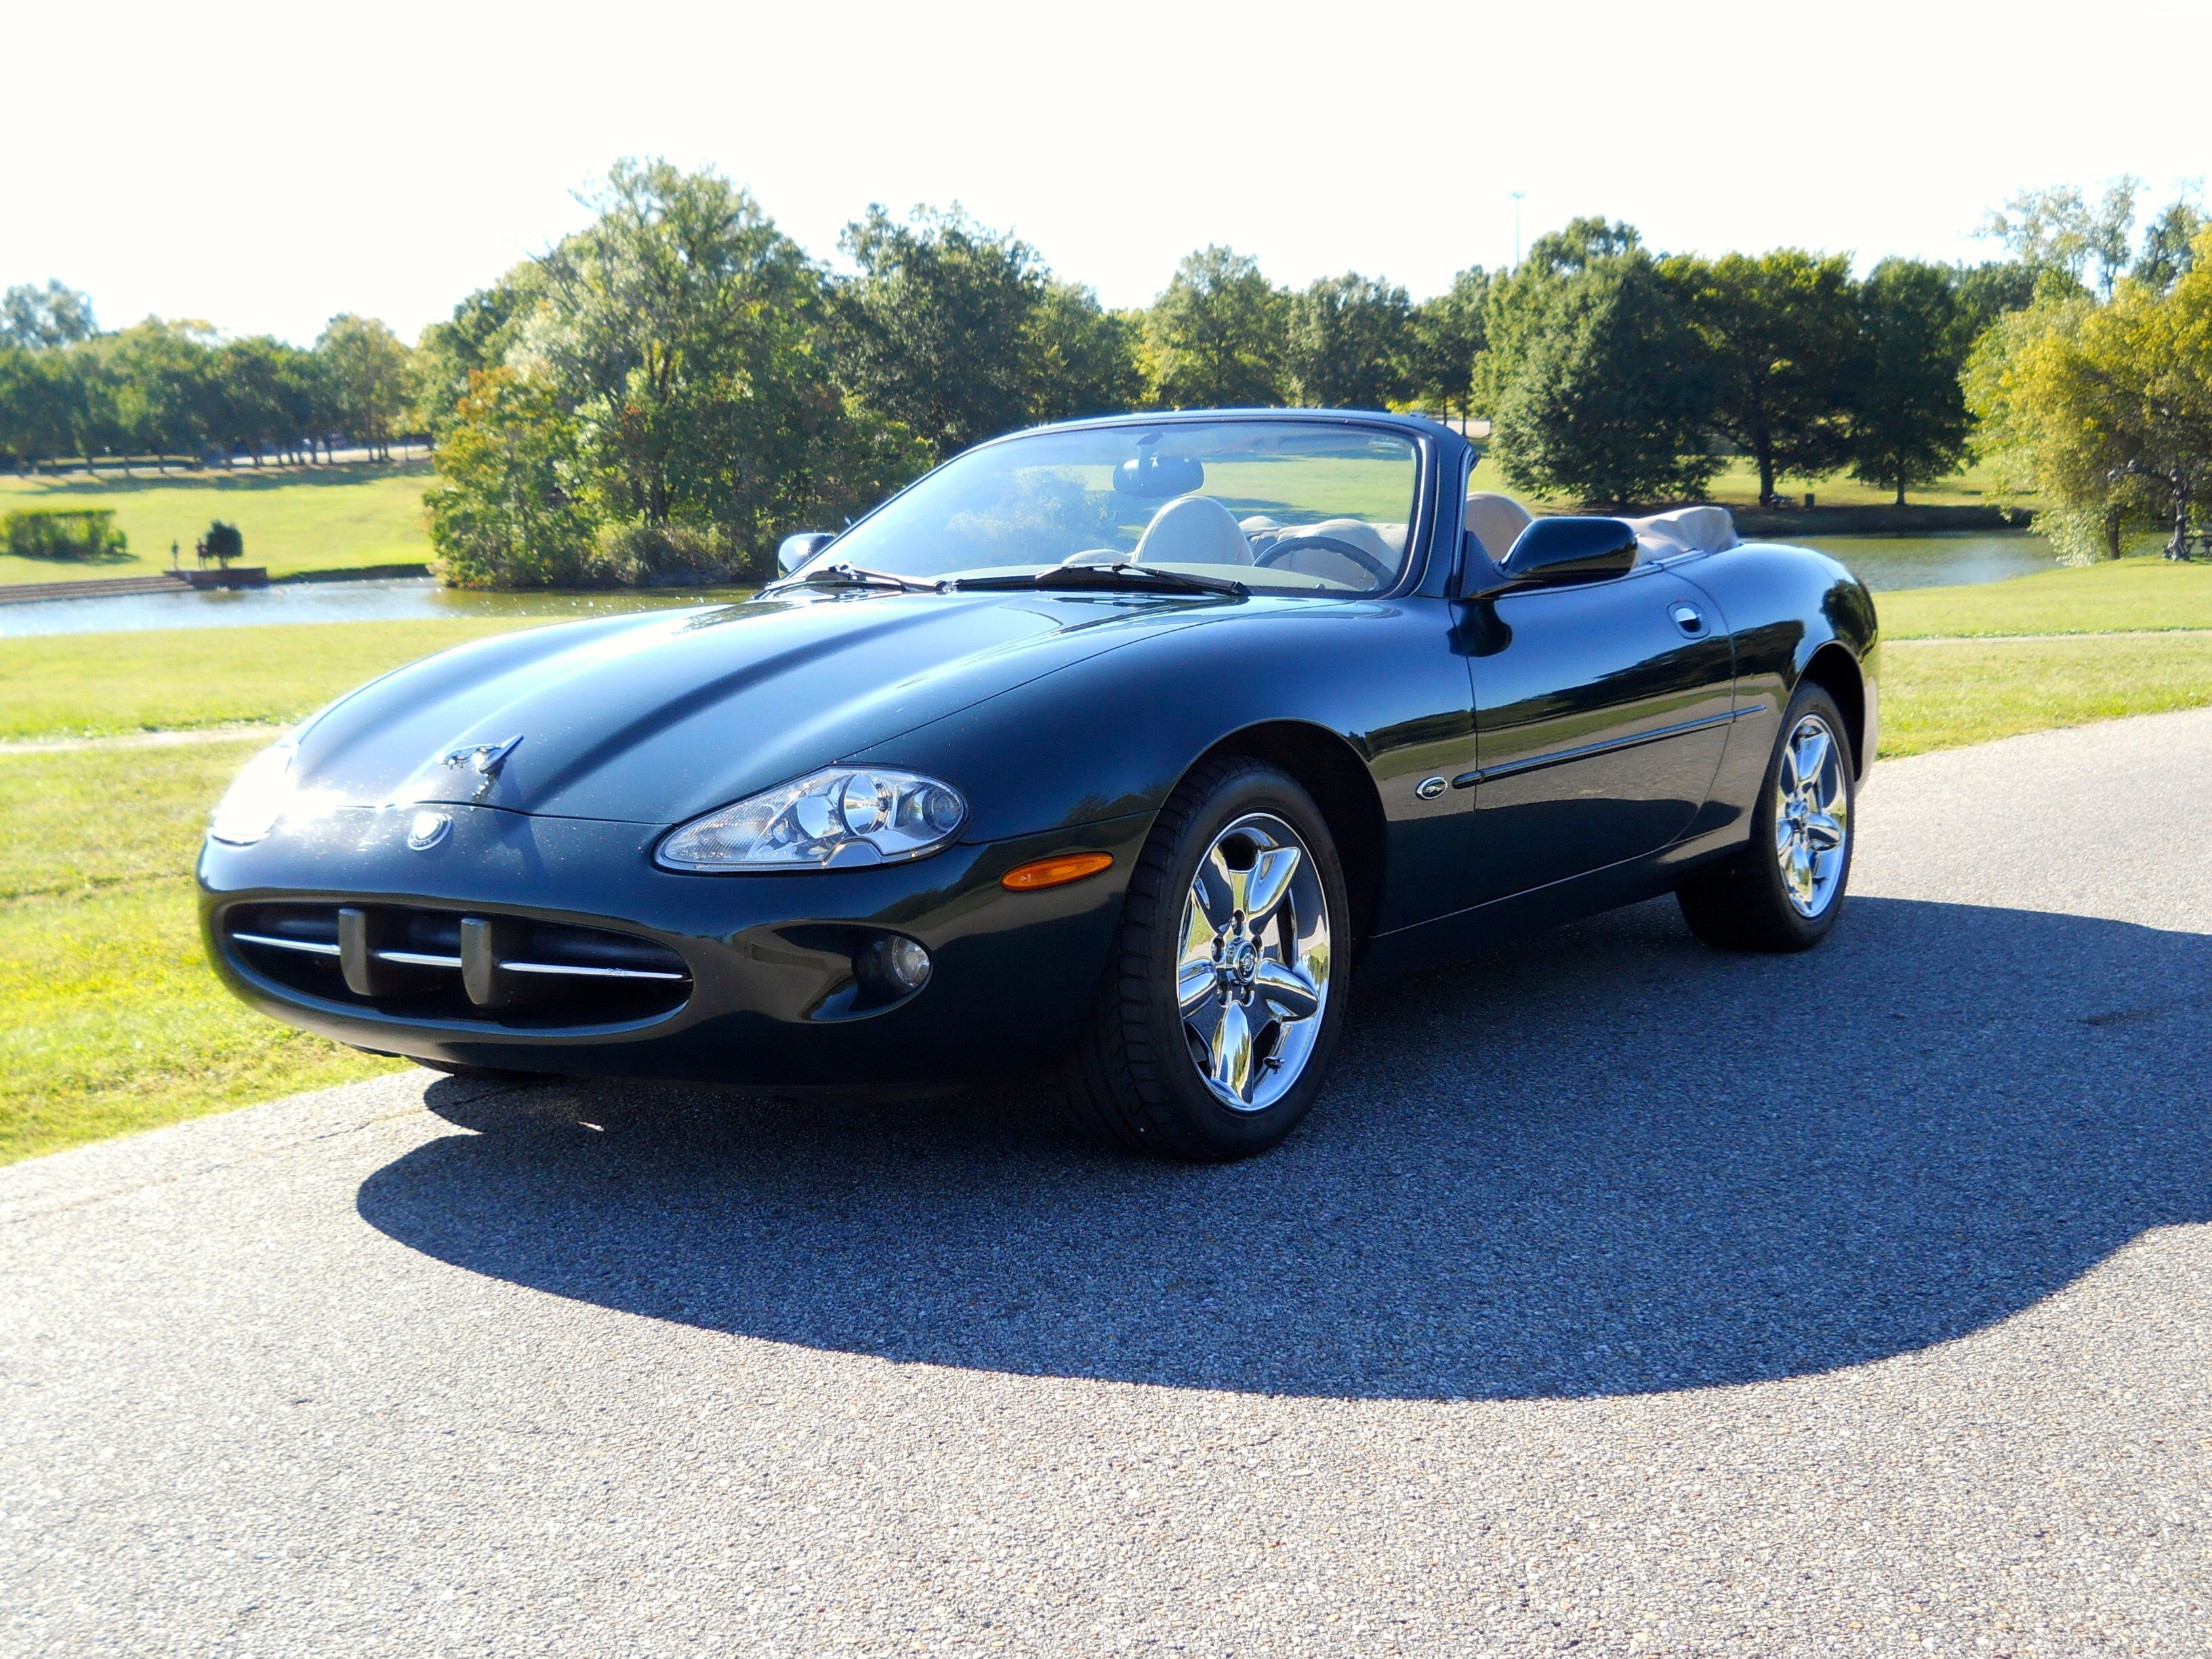 htm convertible garrett jaguar matt